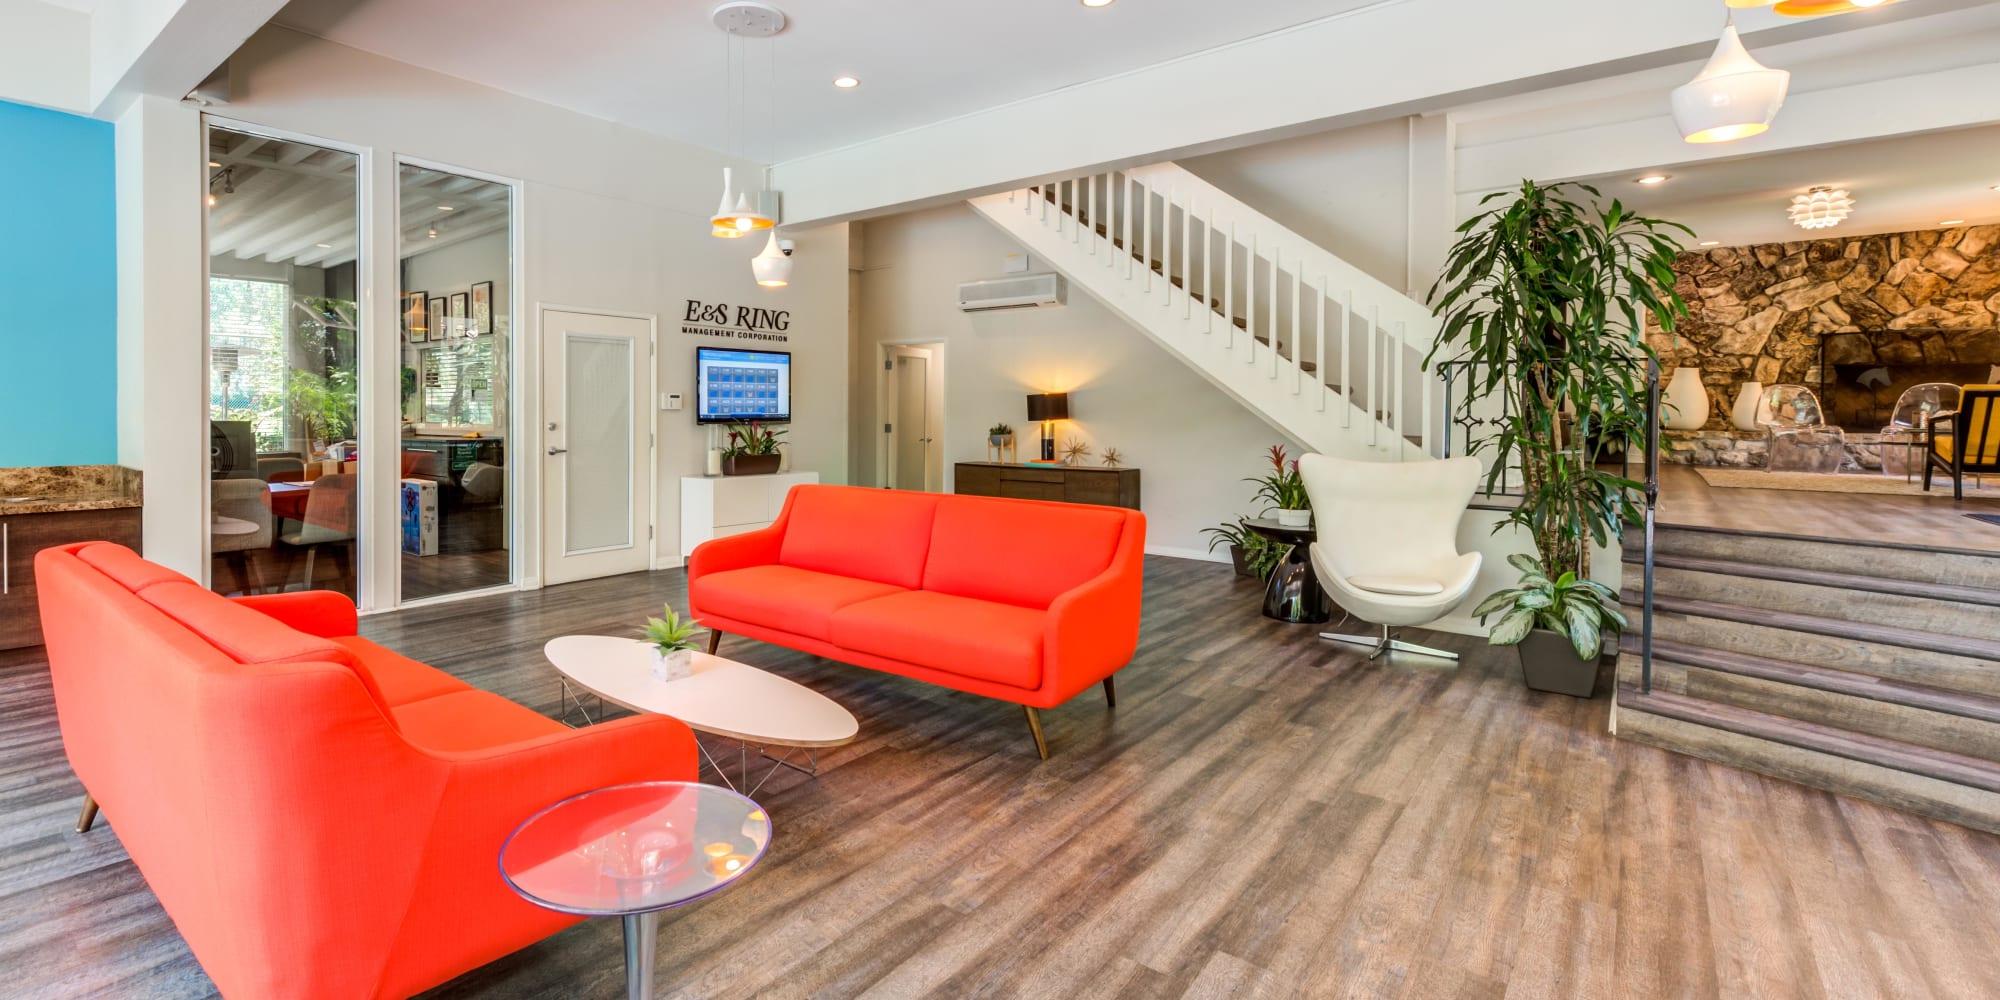 Retro-modern furnishings in the lobby at Rancho Los Feliz in Los Angeles, California